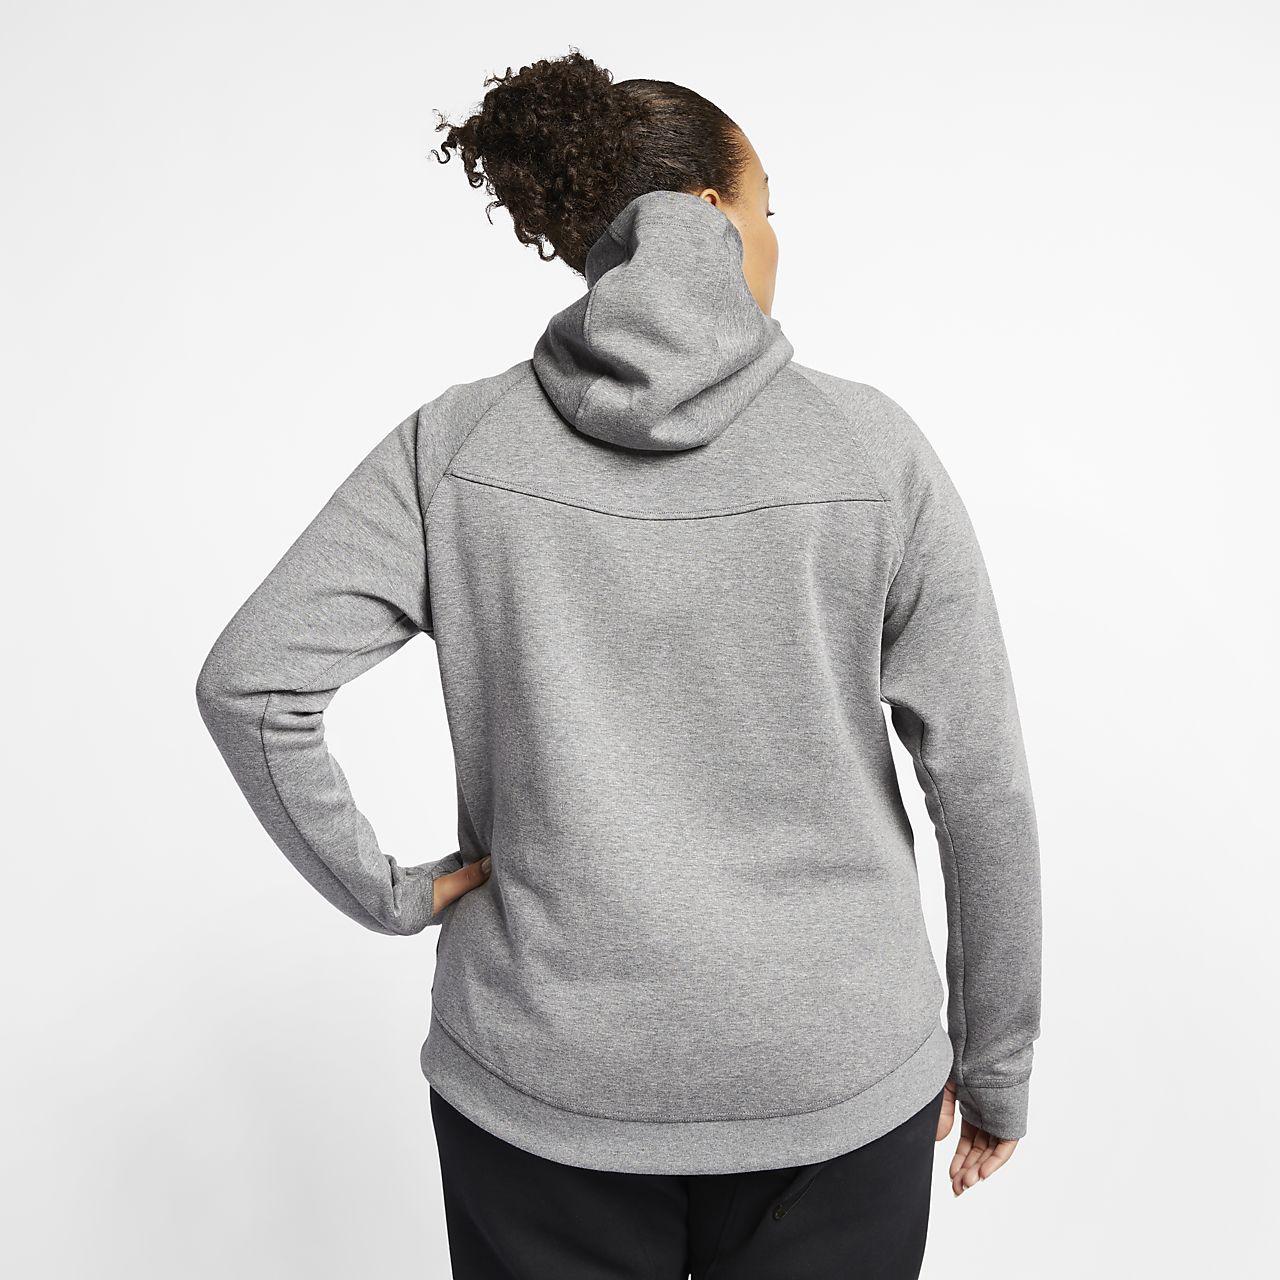 Nike Tech Fleece Full Zip Hoody Women Hoodies & sweatshirts Women Hoodies & sweatshirts COLOUR-black